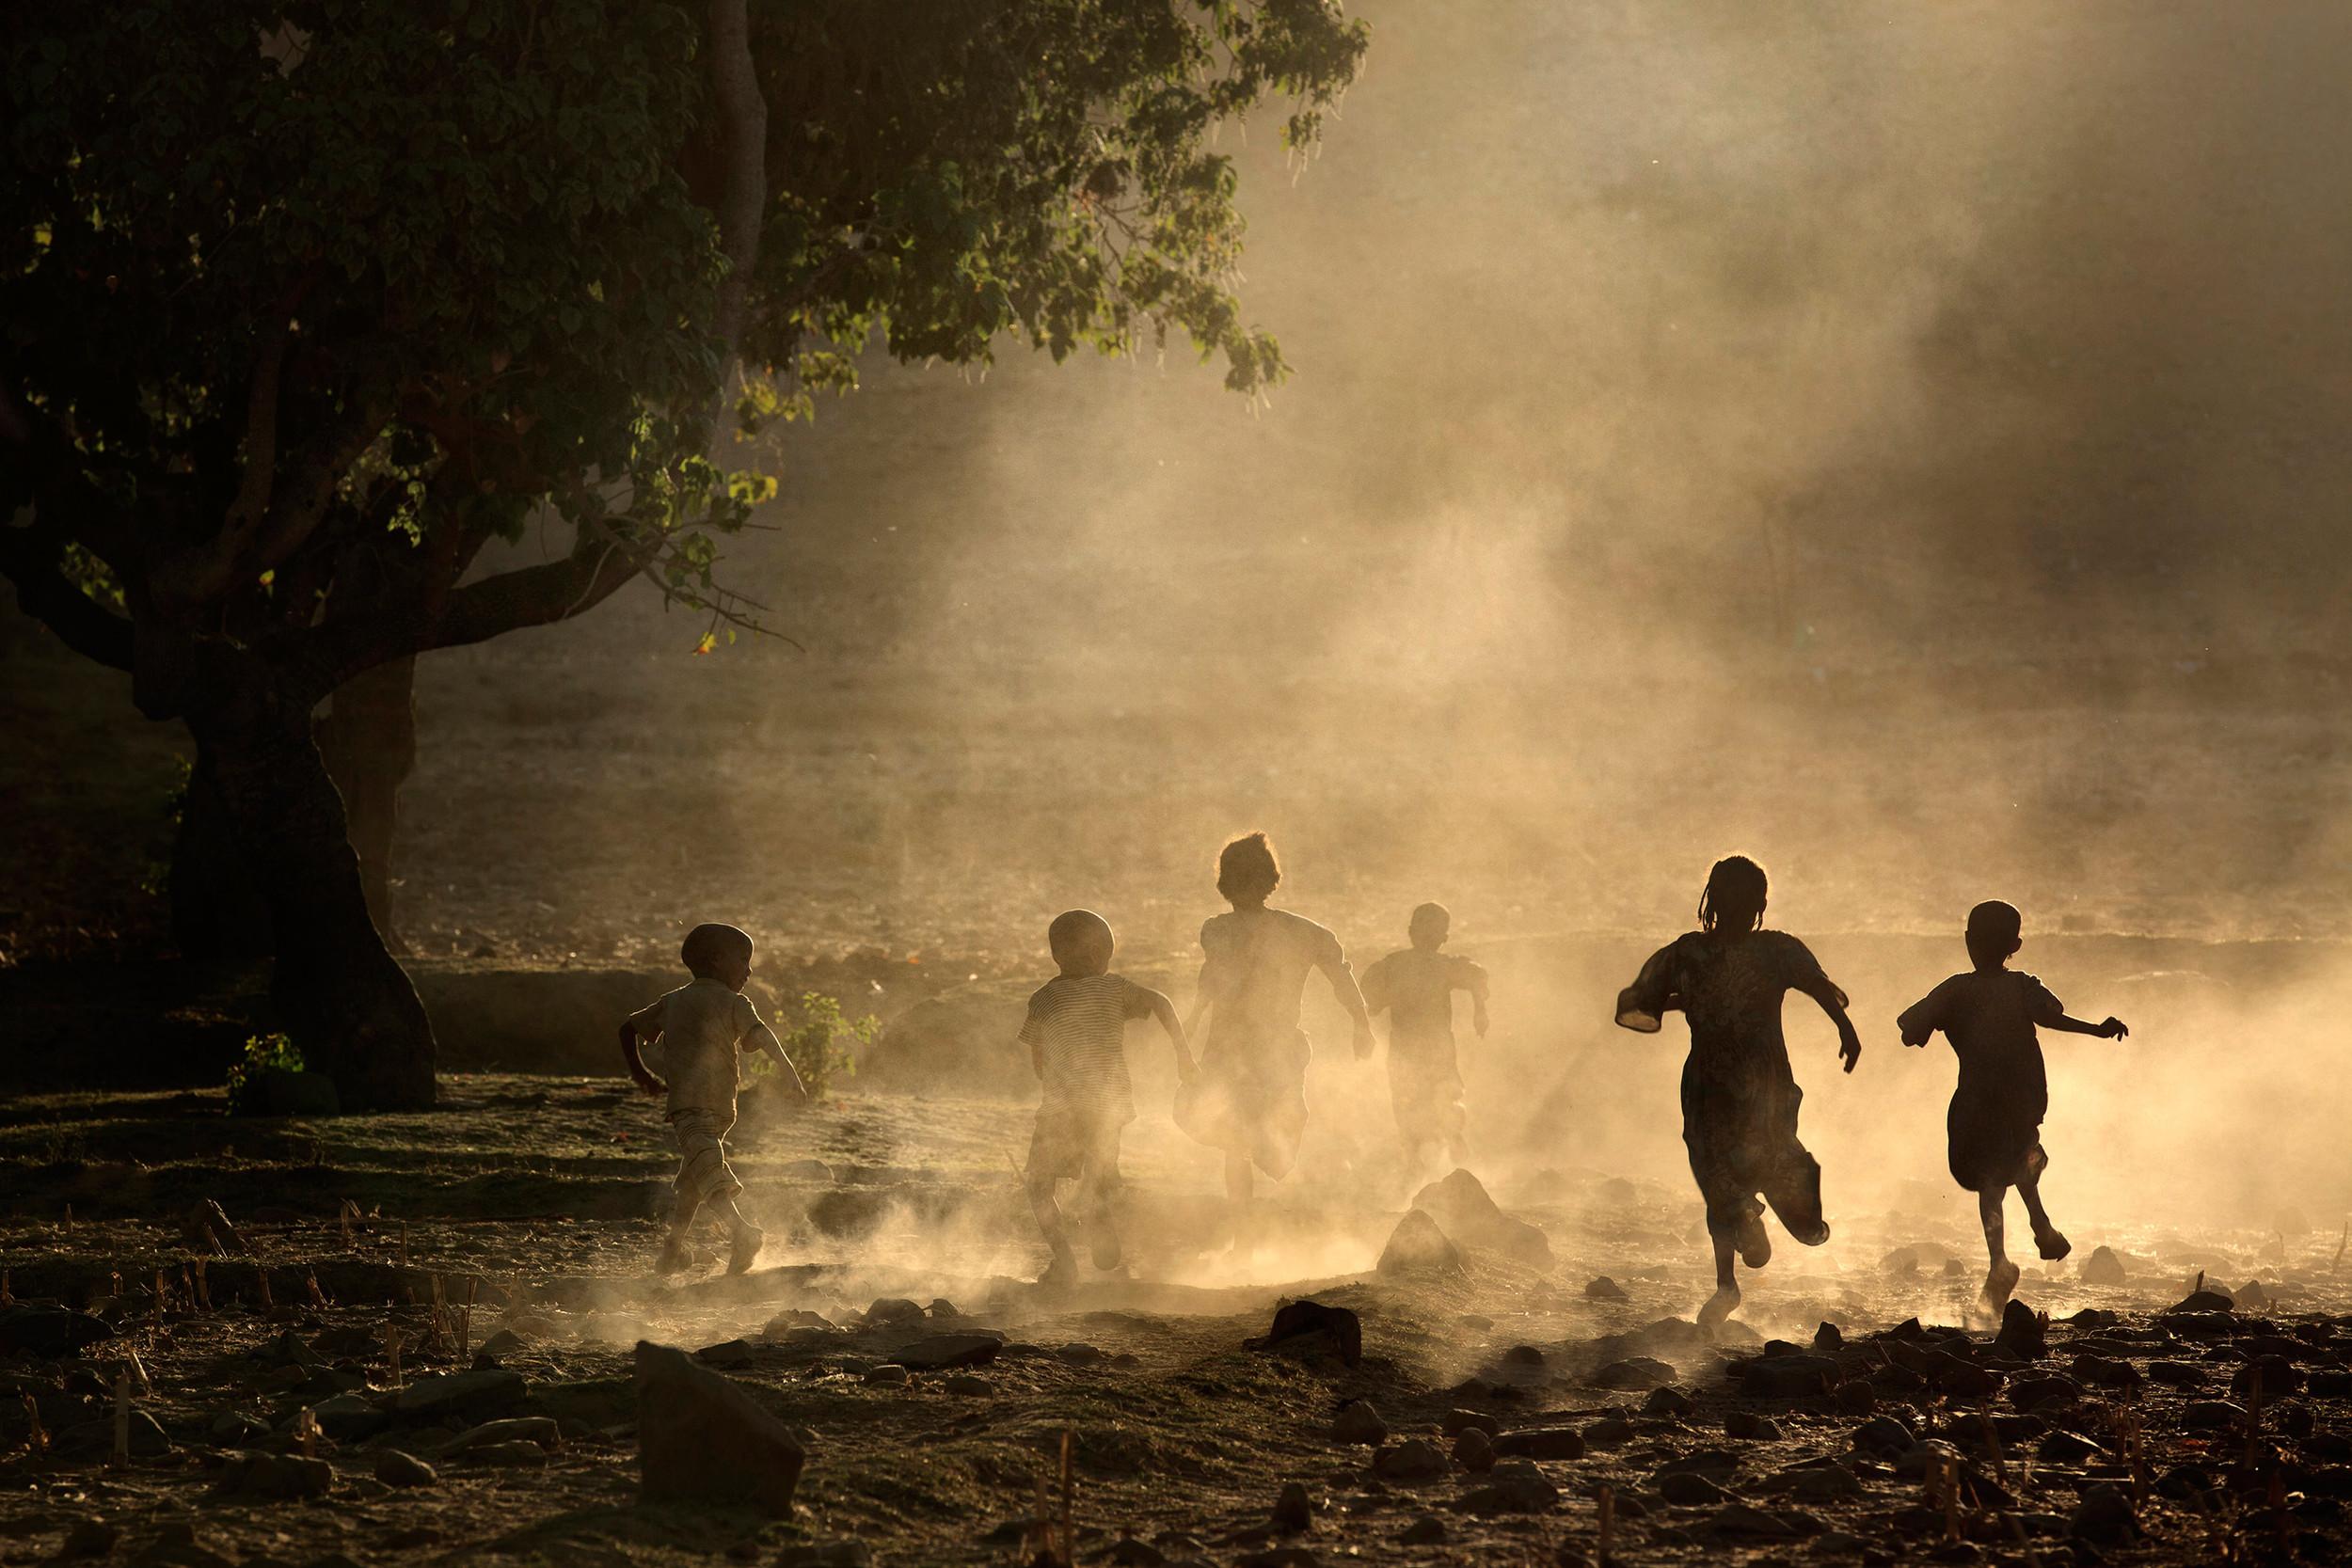 Tigrayan children kicking up dust at sunset